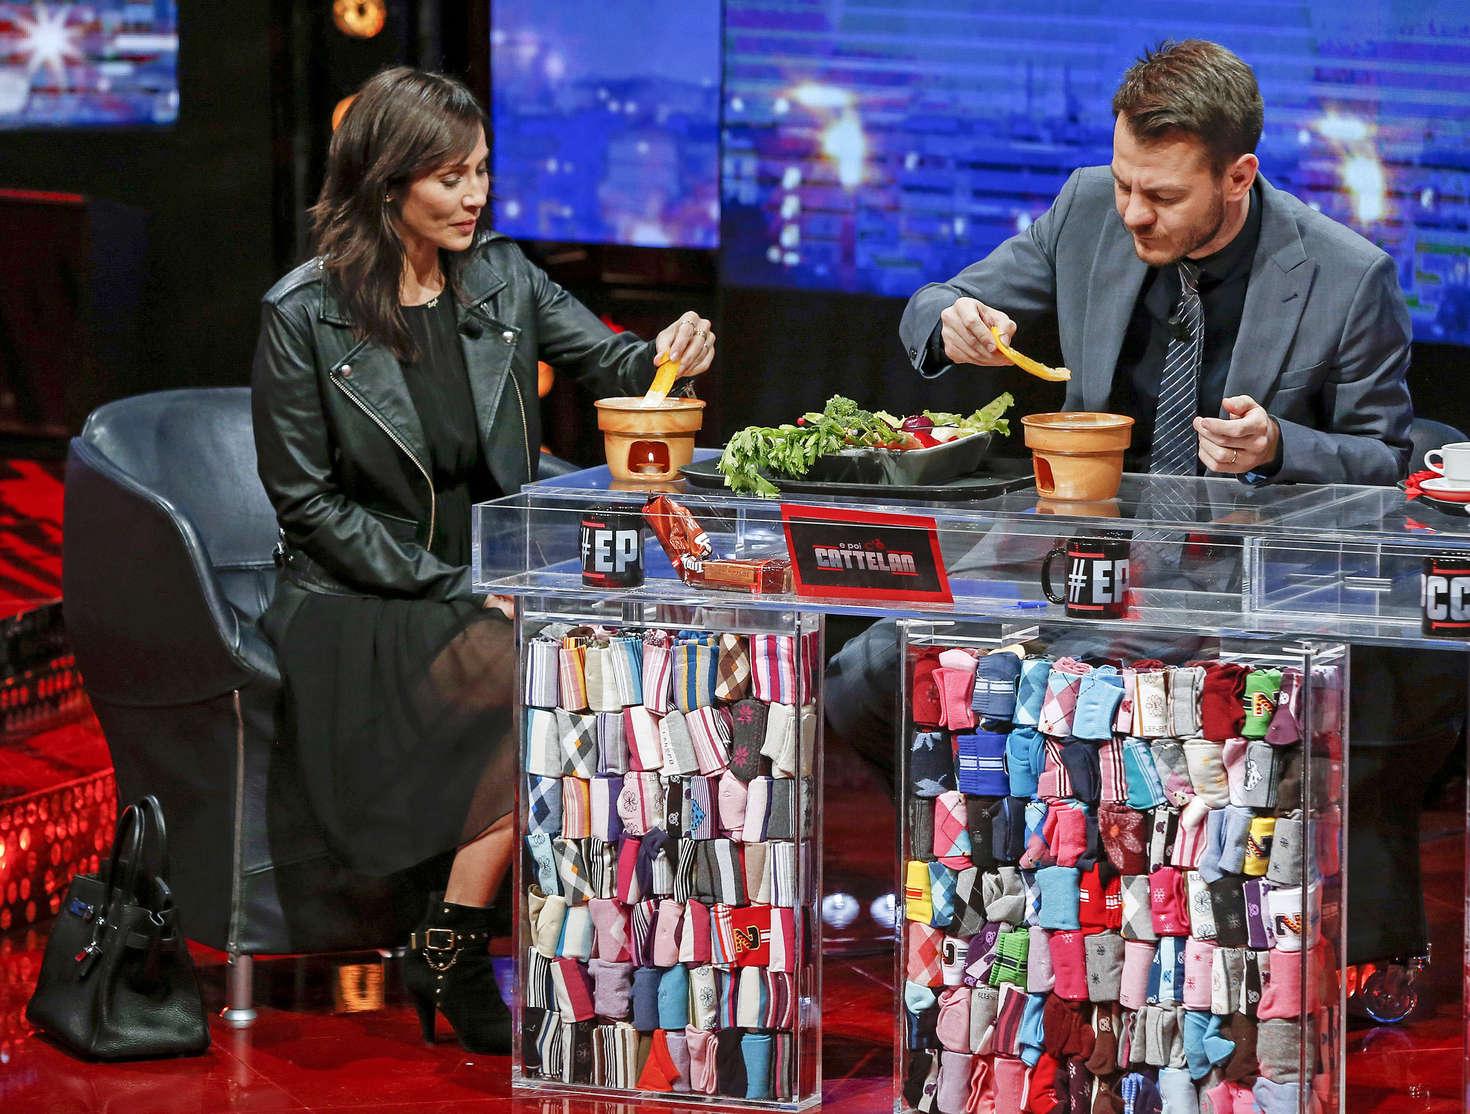 Natalie Imbruglia TV Show E poi ce Cattelan in Italy